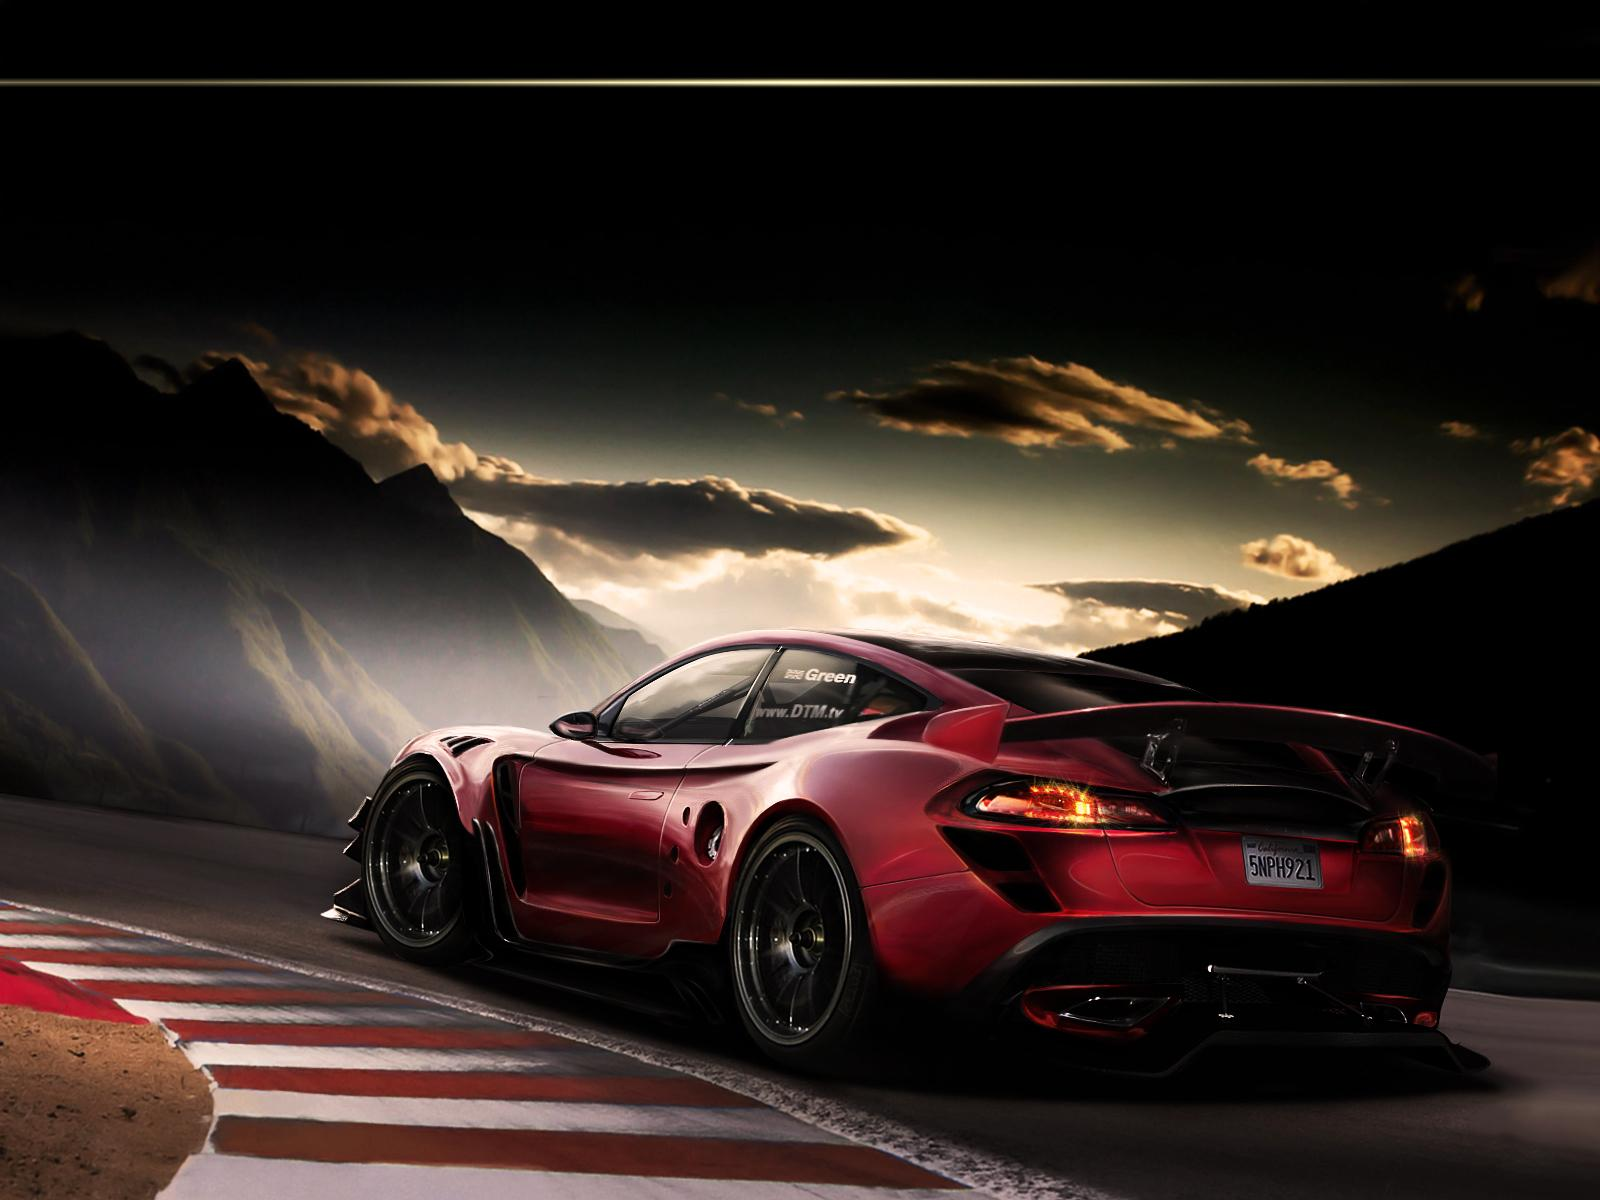 40 tane harika masa st hd resimler hd resimler rooteto - Racing cars wallpapers for mobile ...